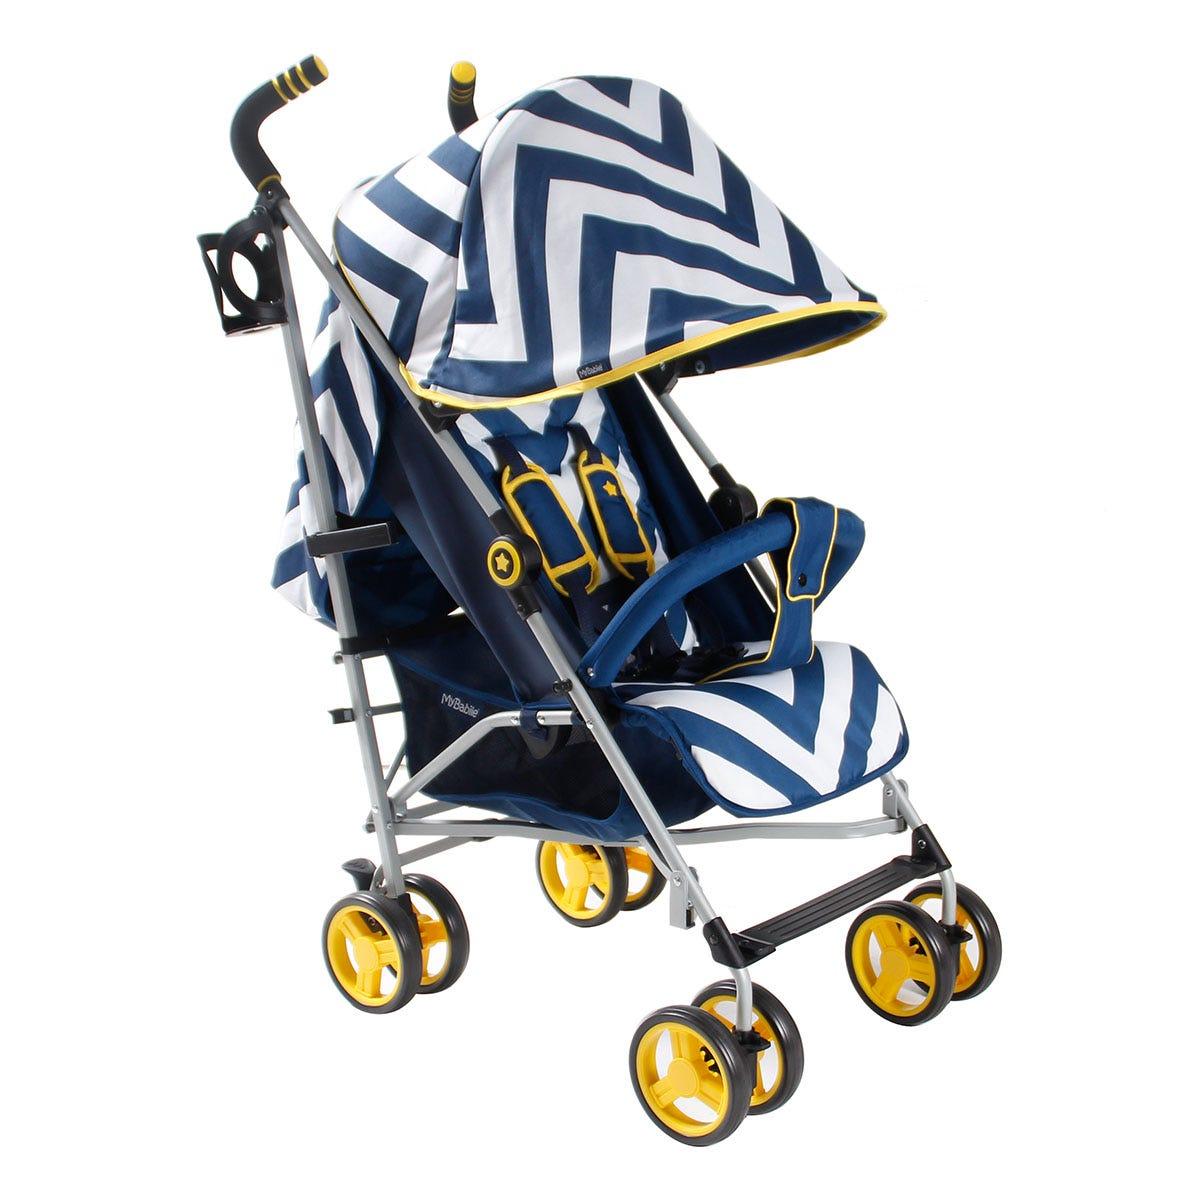 My Babiie MB02 Stroller - Blue Chevron